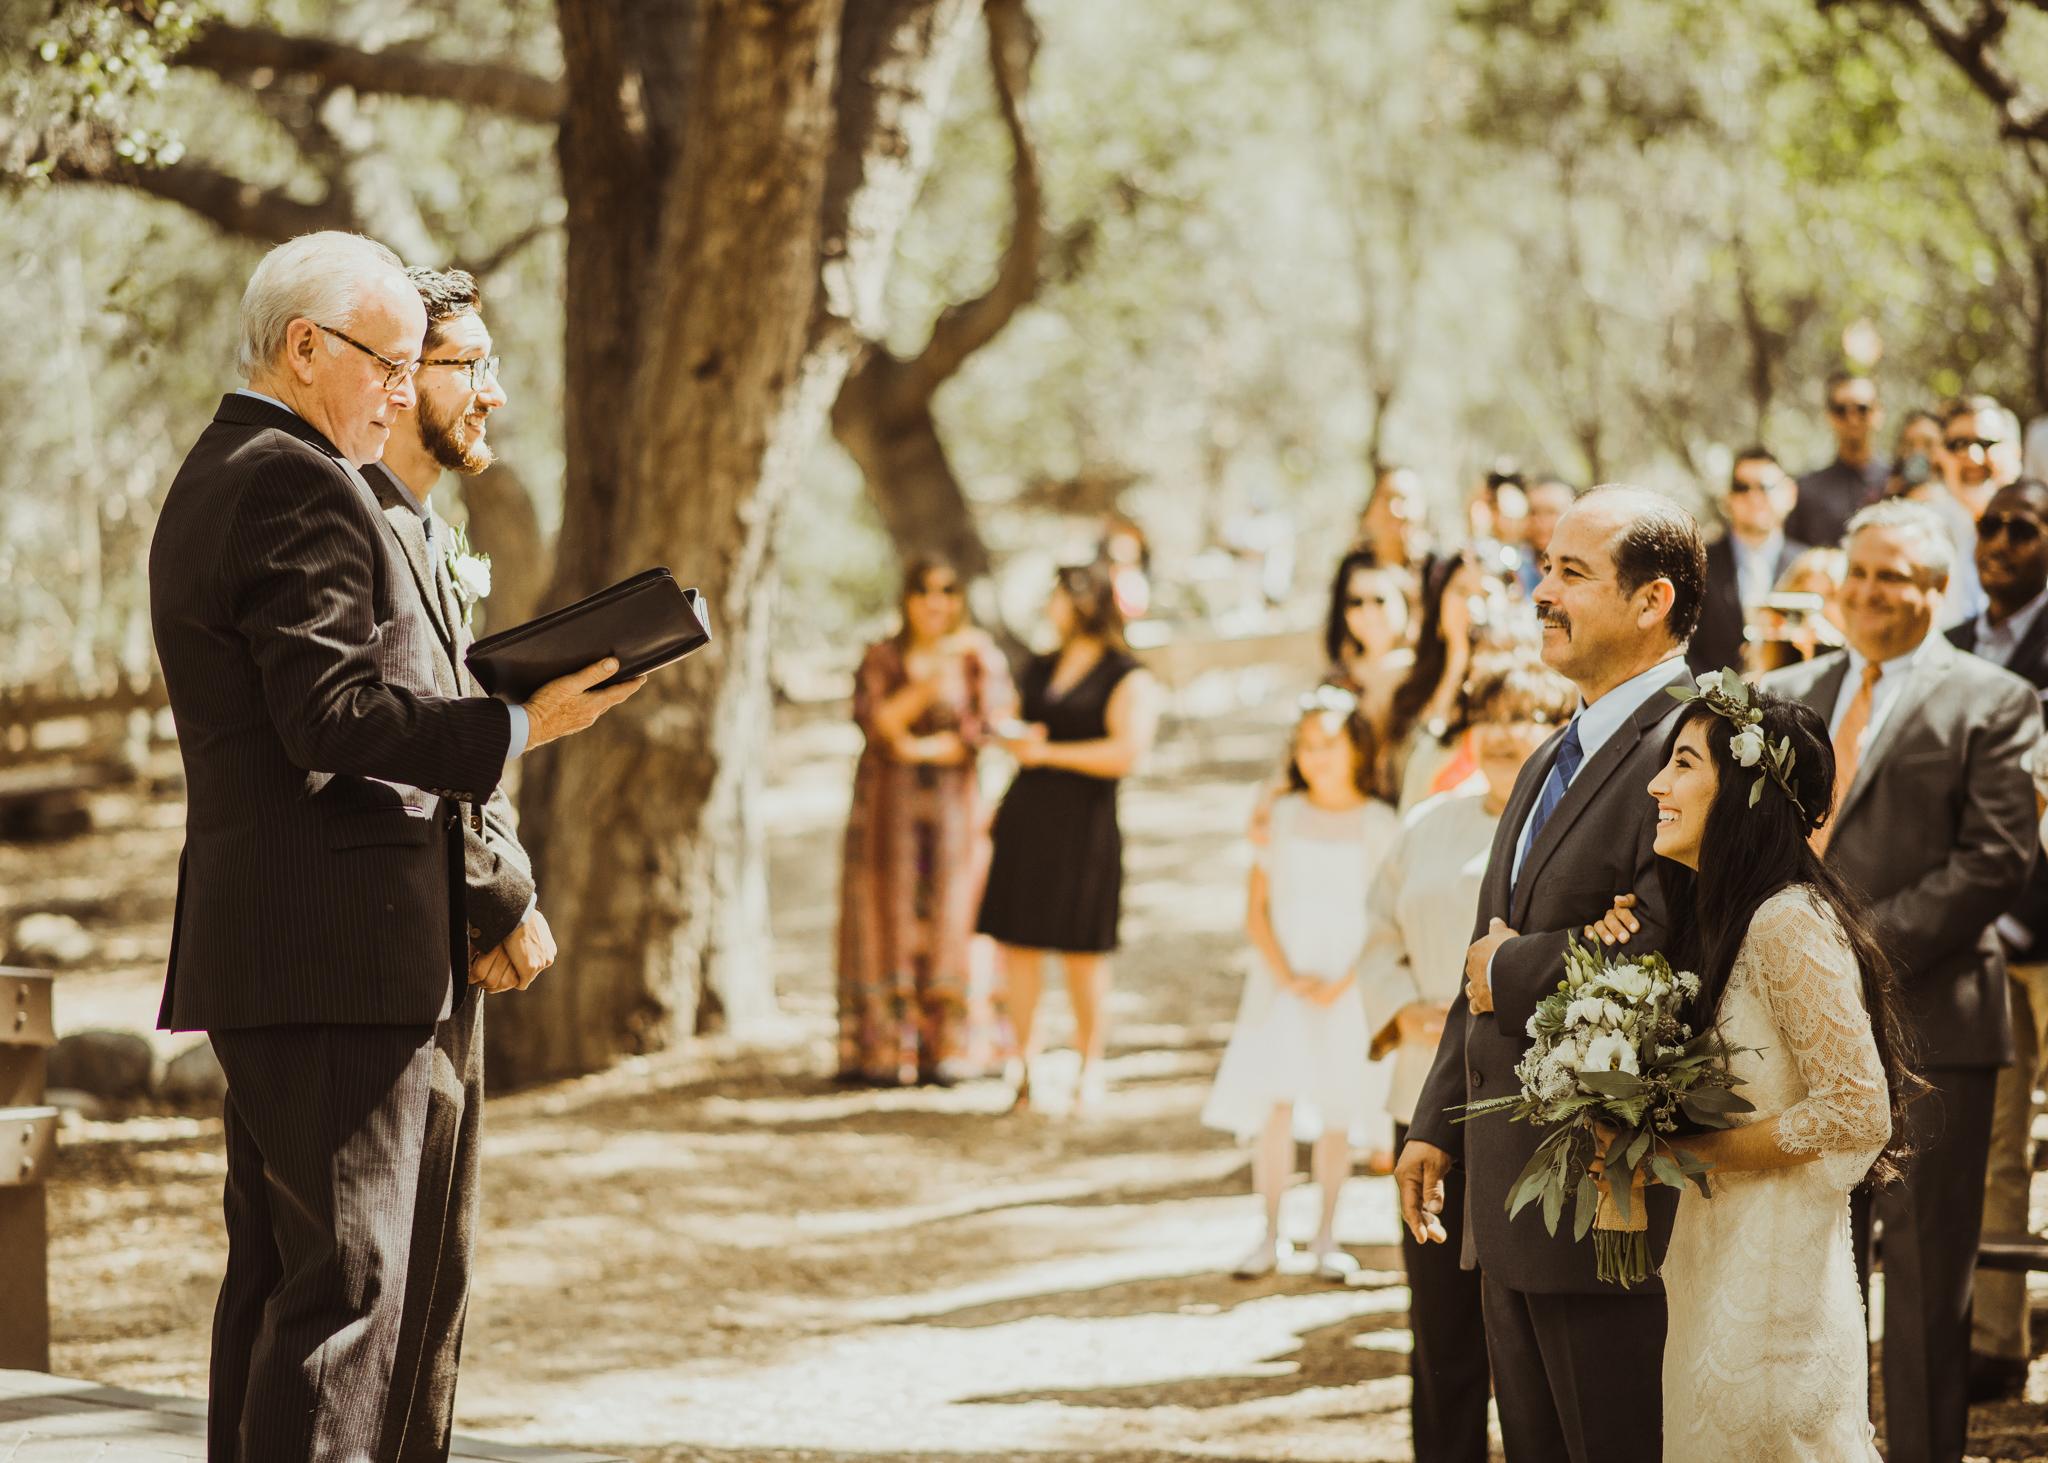 ©Isaiah-&-Taylor-Photography---Oak-Canyon-Nature-Center-Wedding,-Anaheim-Hills-043.jpg